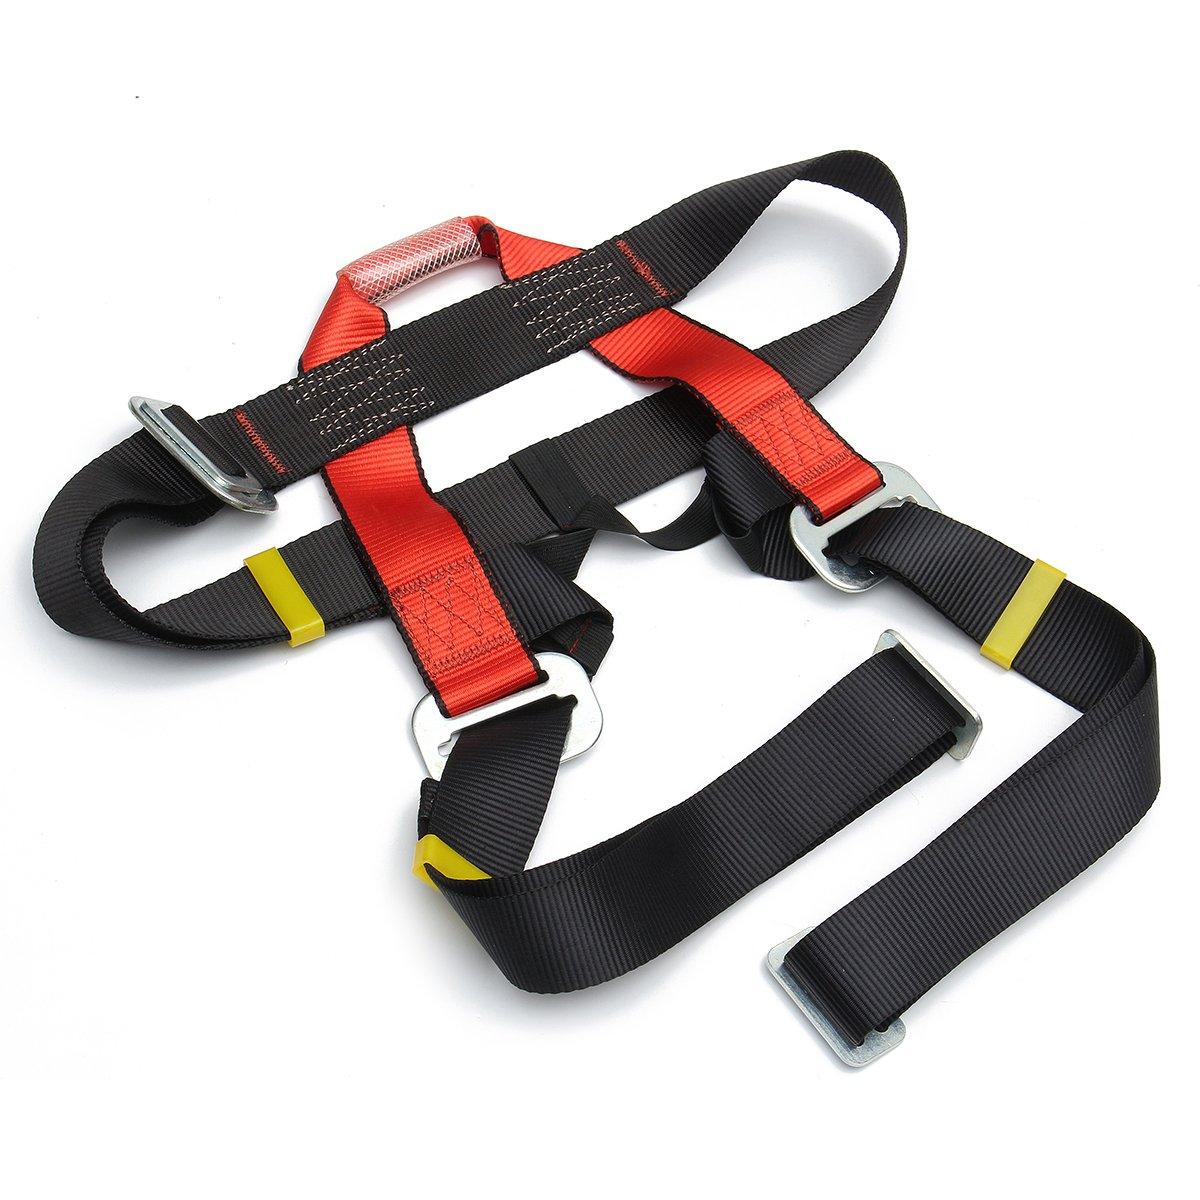 QOJA outdoor mountain rock climbing rappelling harness bust belt by QOJA (Image #3)